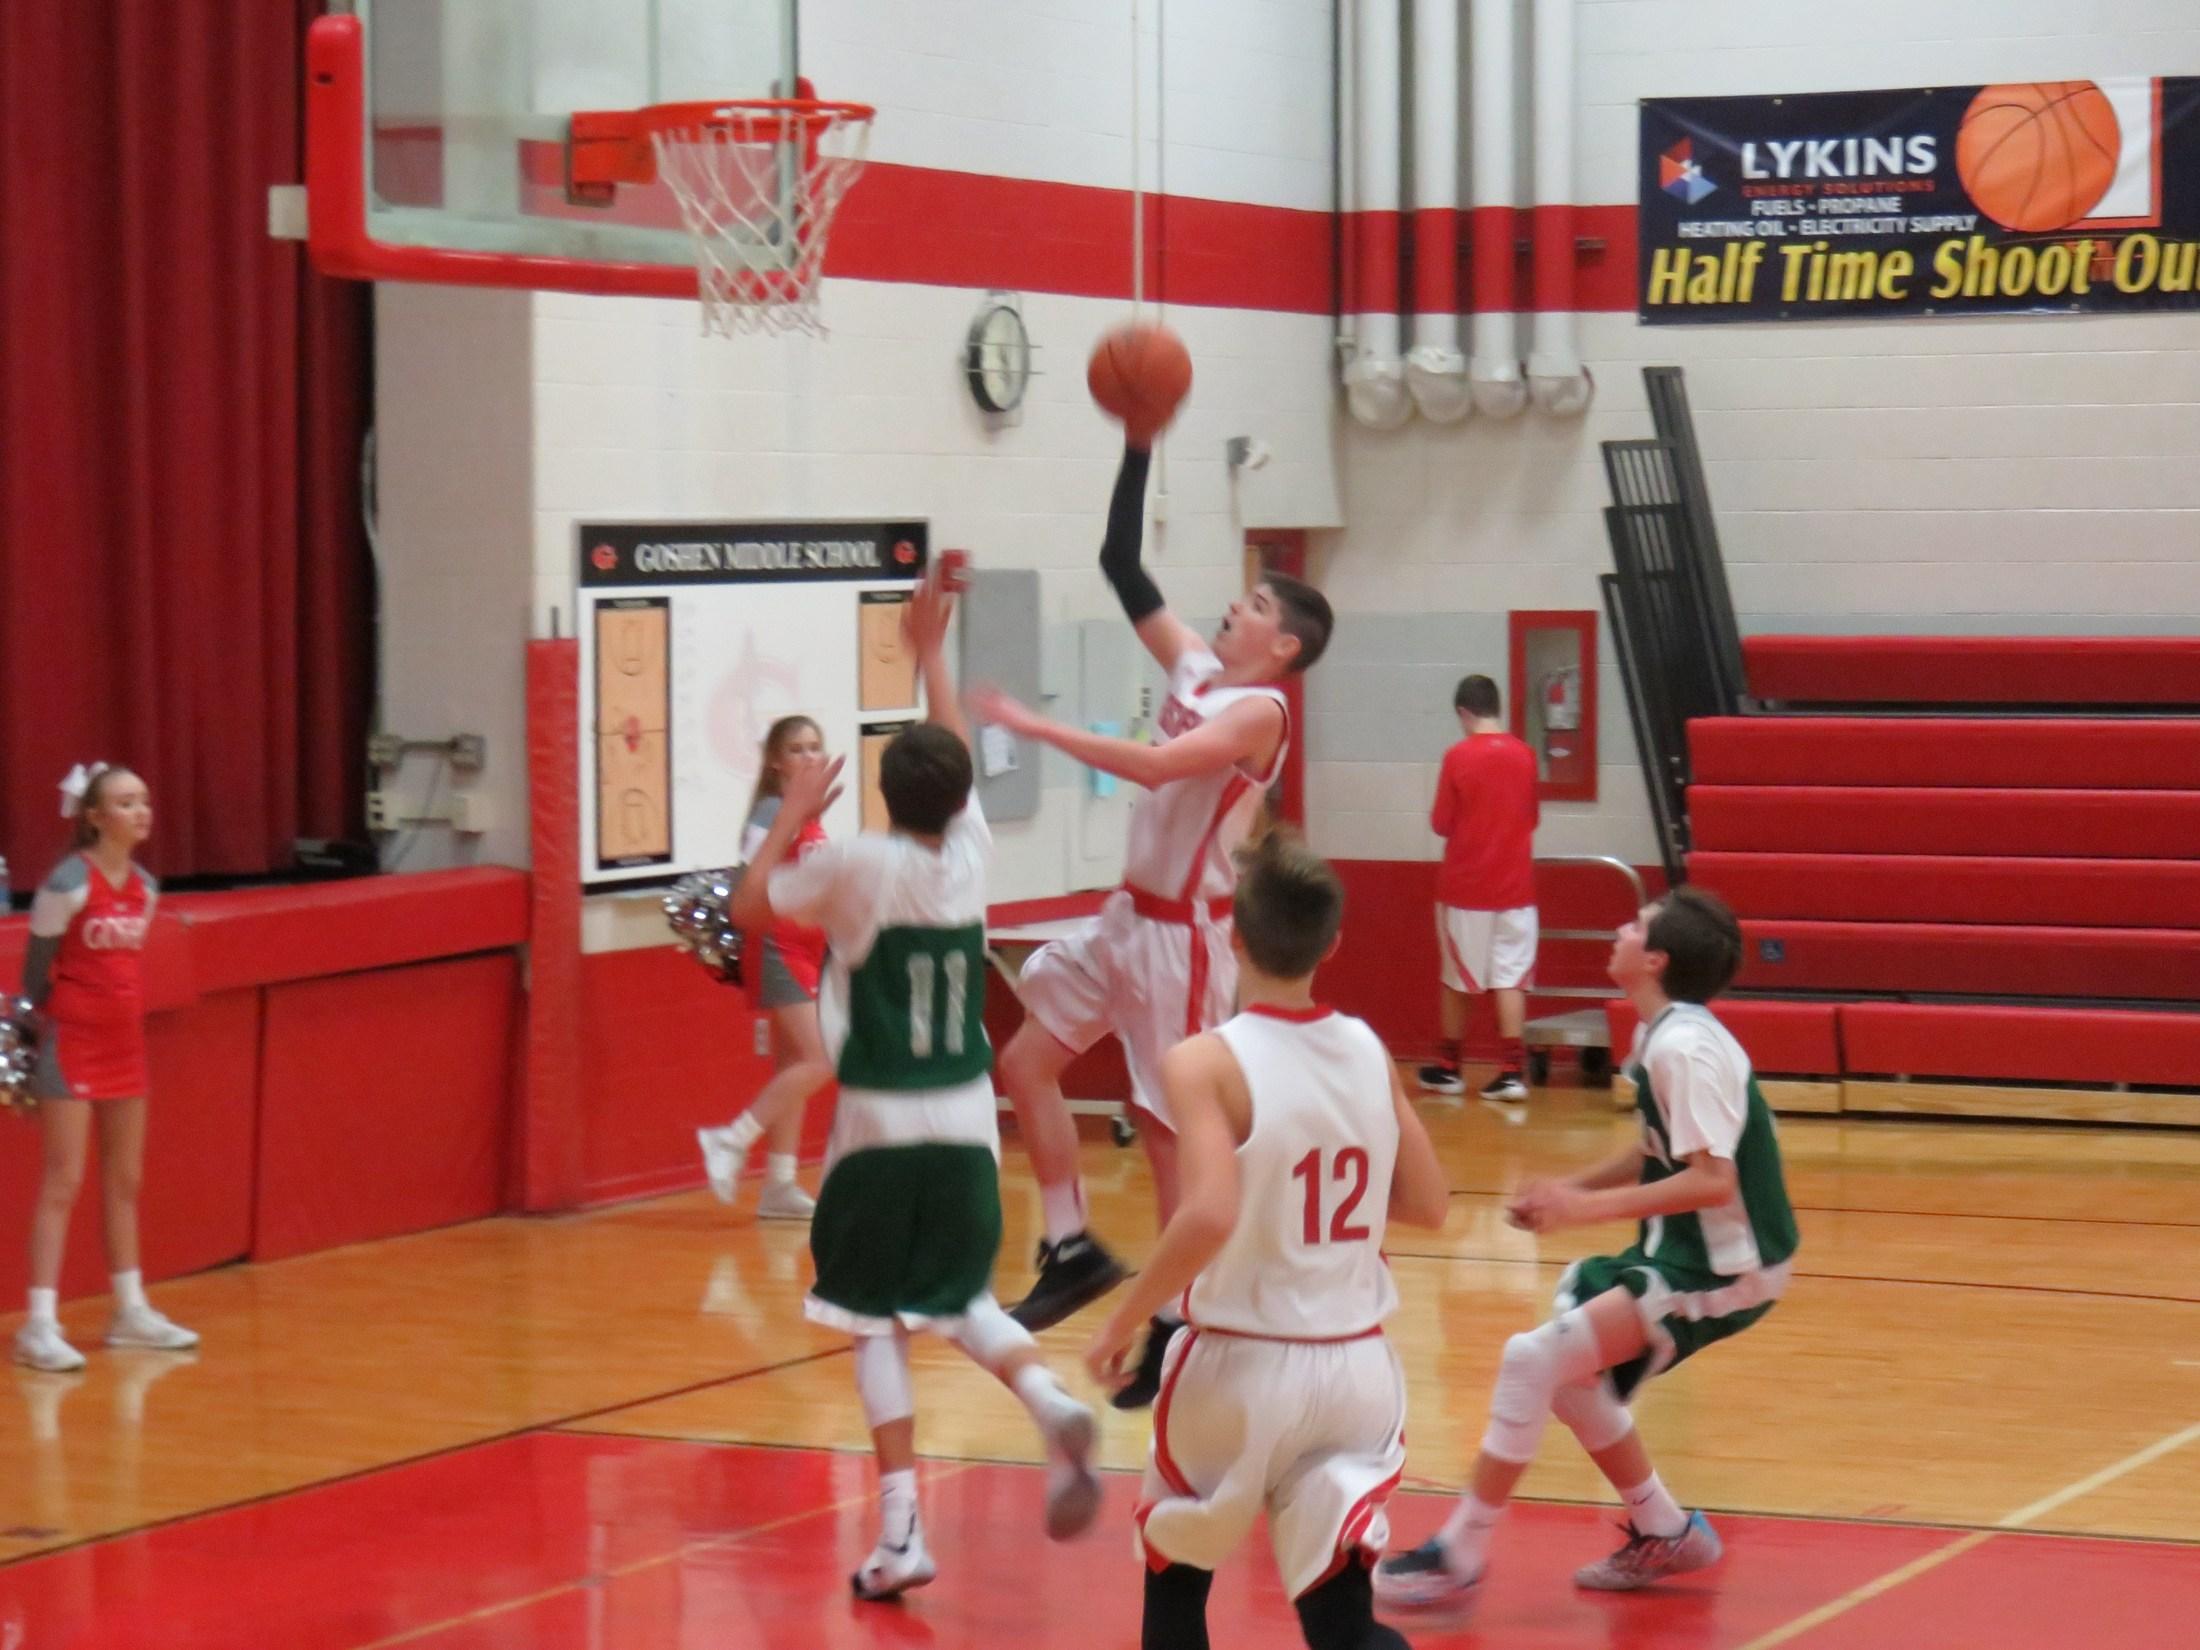 7th grade boys basketball player Garrettt Whitaker